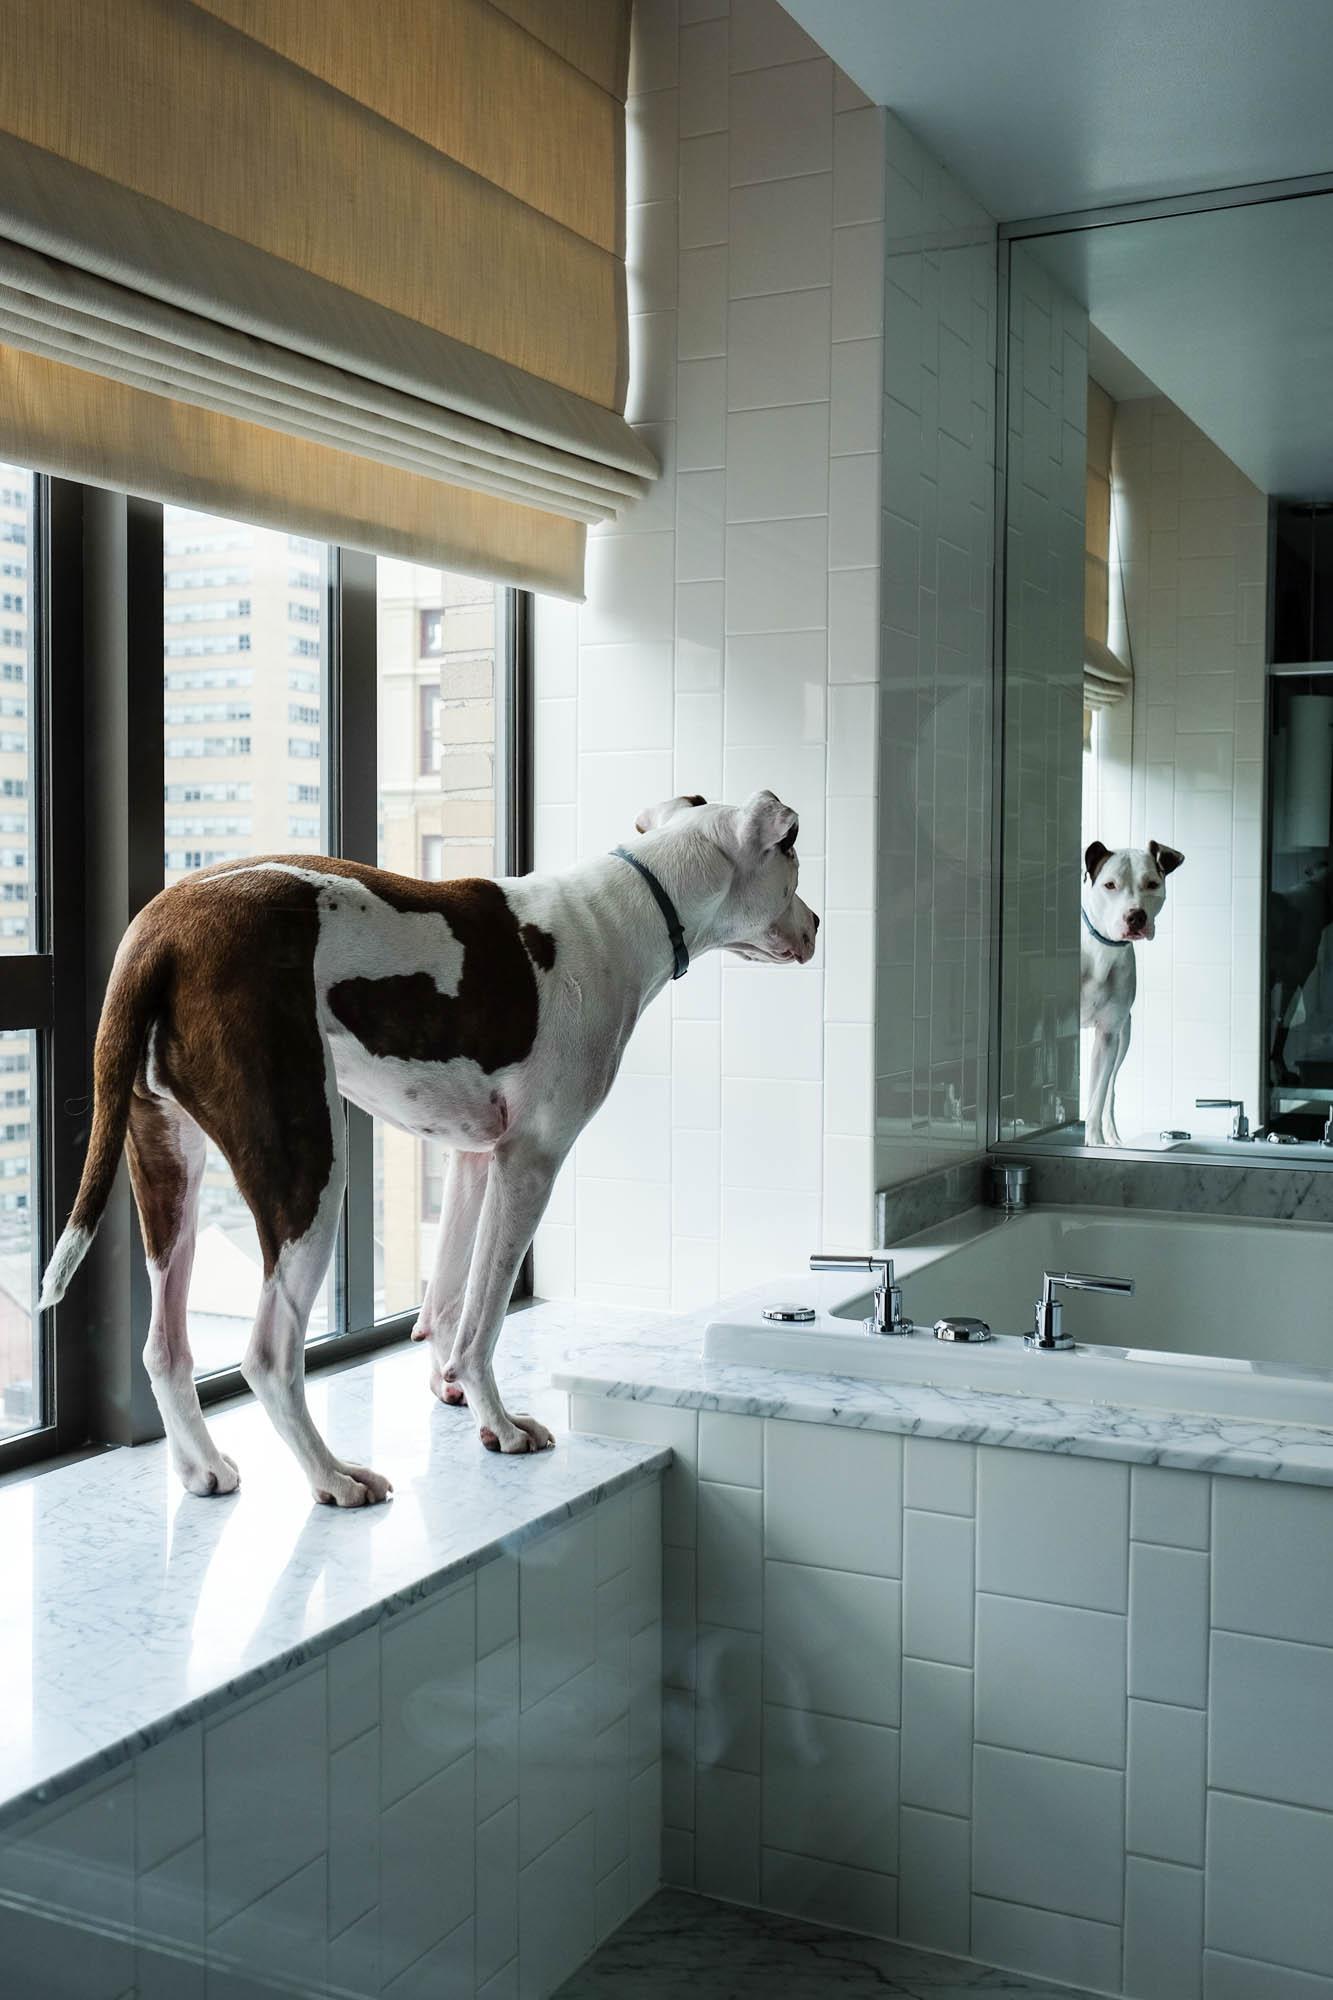 Kimpton_Palomar_Dog_Friendly_Hotel_Philadelphia_Photographer_Kristen_Humbert_3